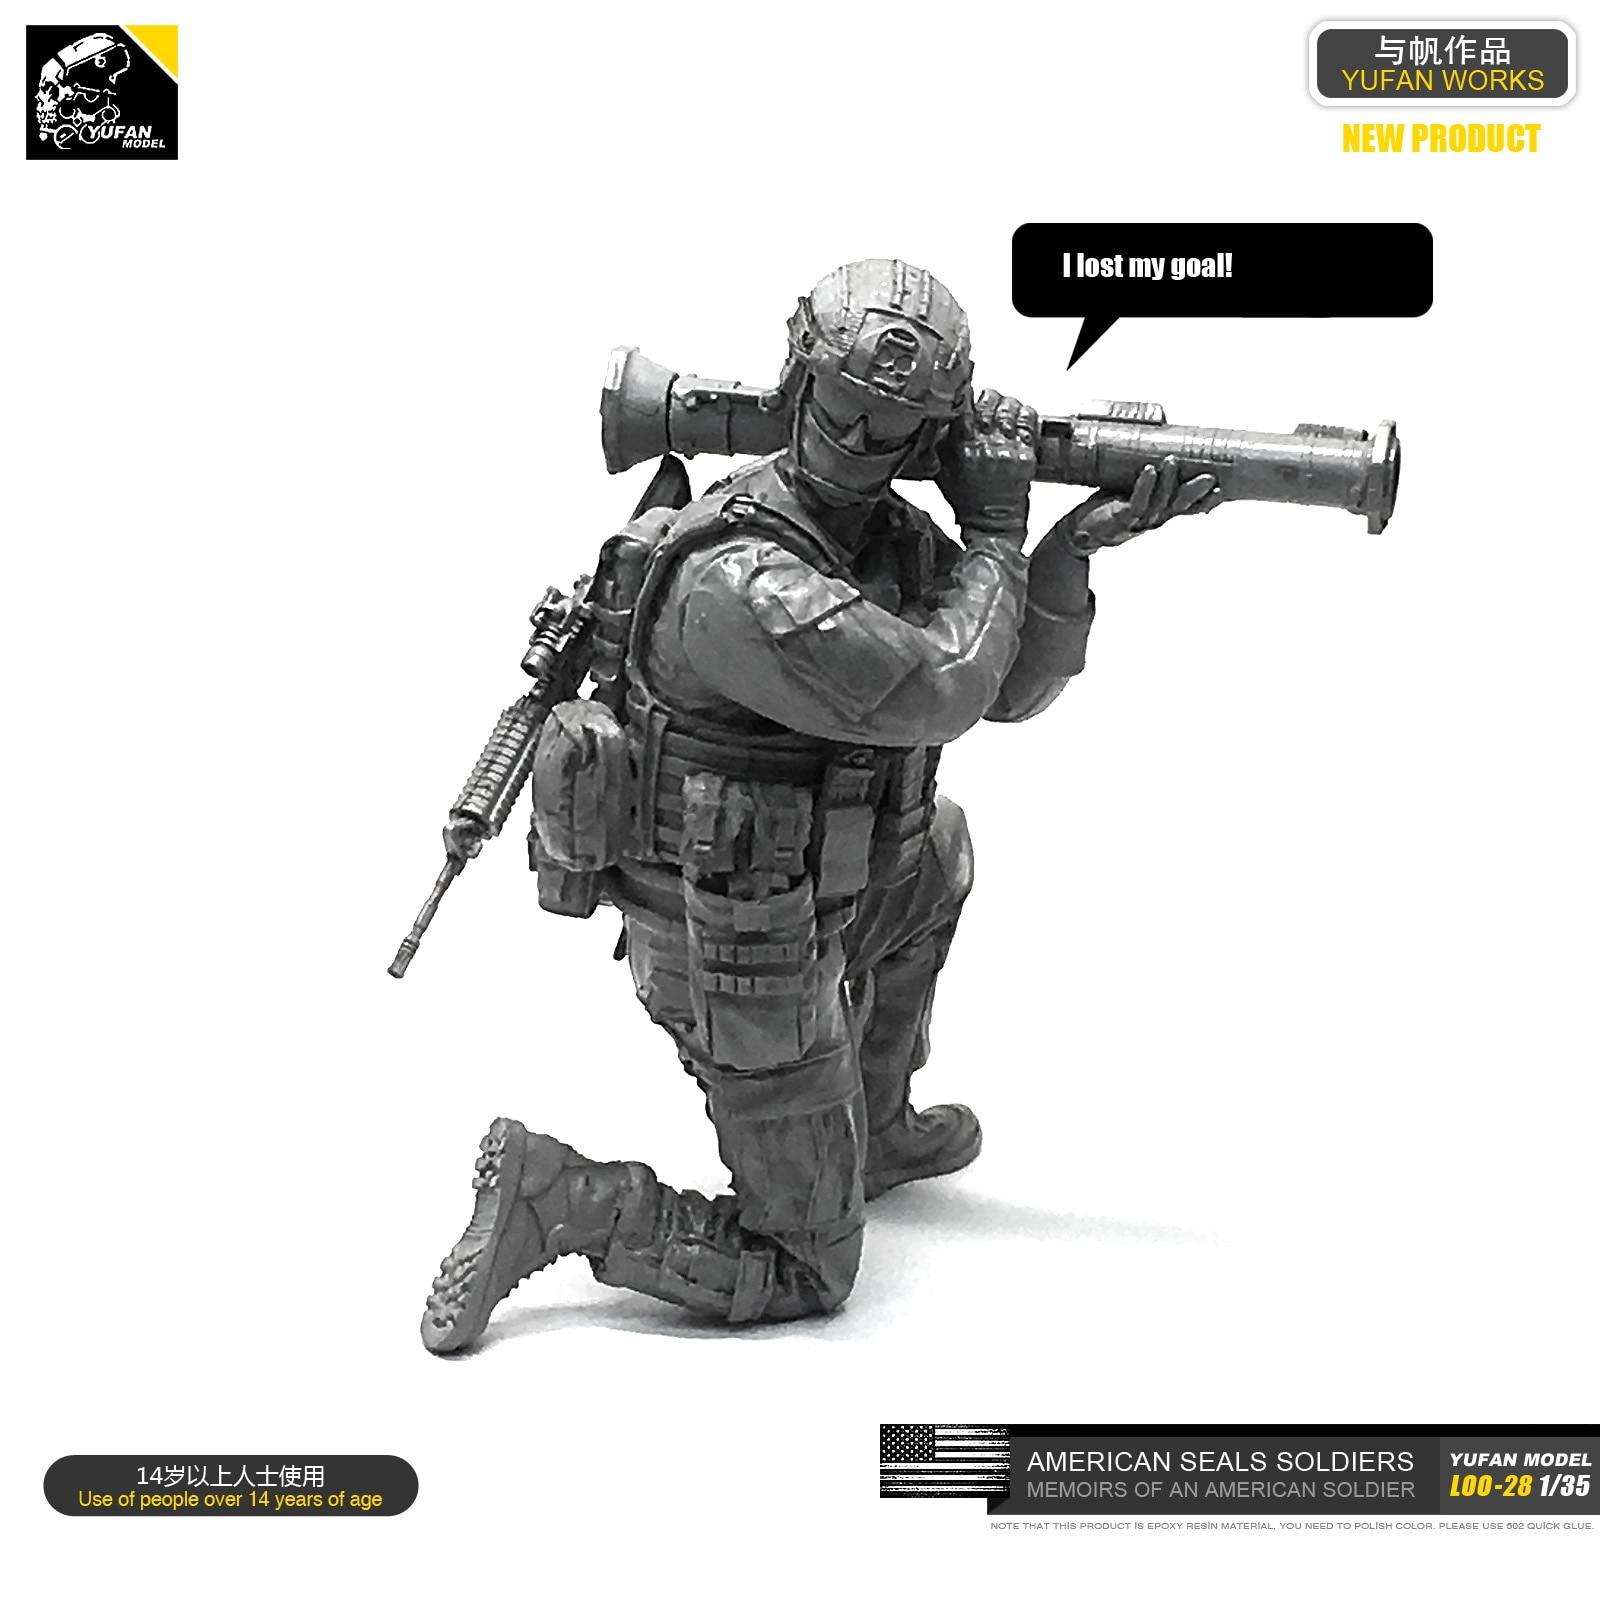 1/35 Resin Kits US Navy SEAL Anti-armor Resin Soldier Self-assembled LOO-28